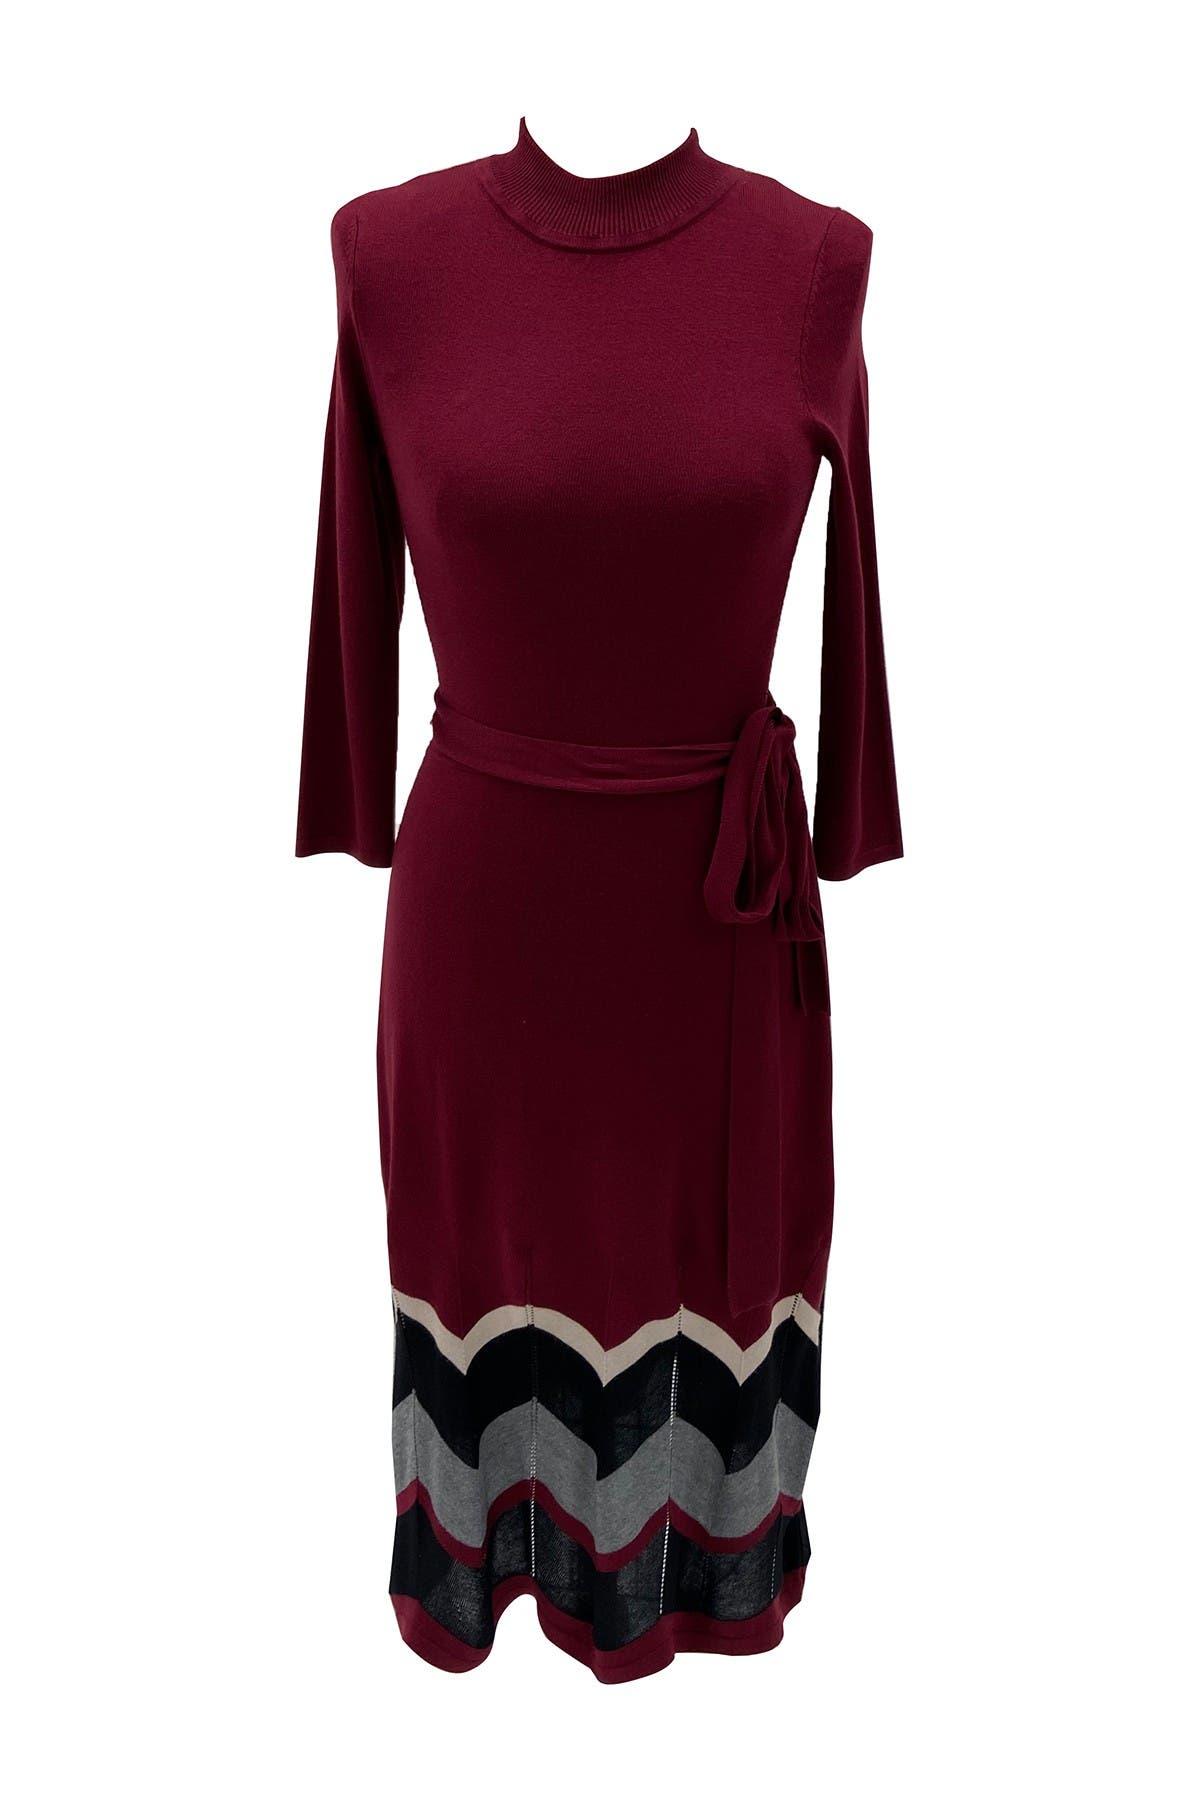 Image of Sandra Darren Mock Neck 3/4 Sleeve Sweater Dress